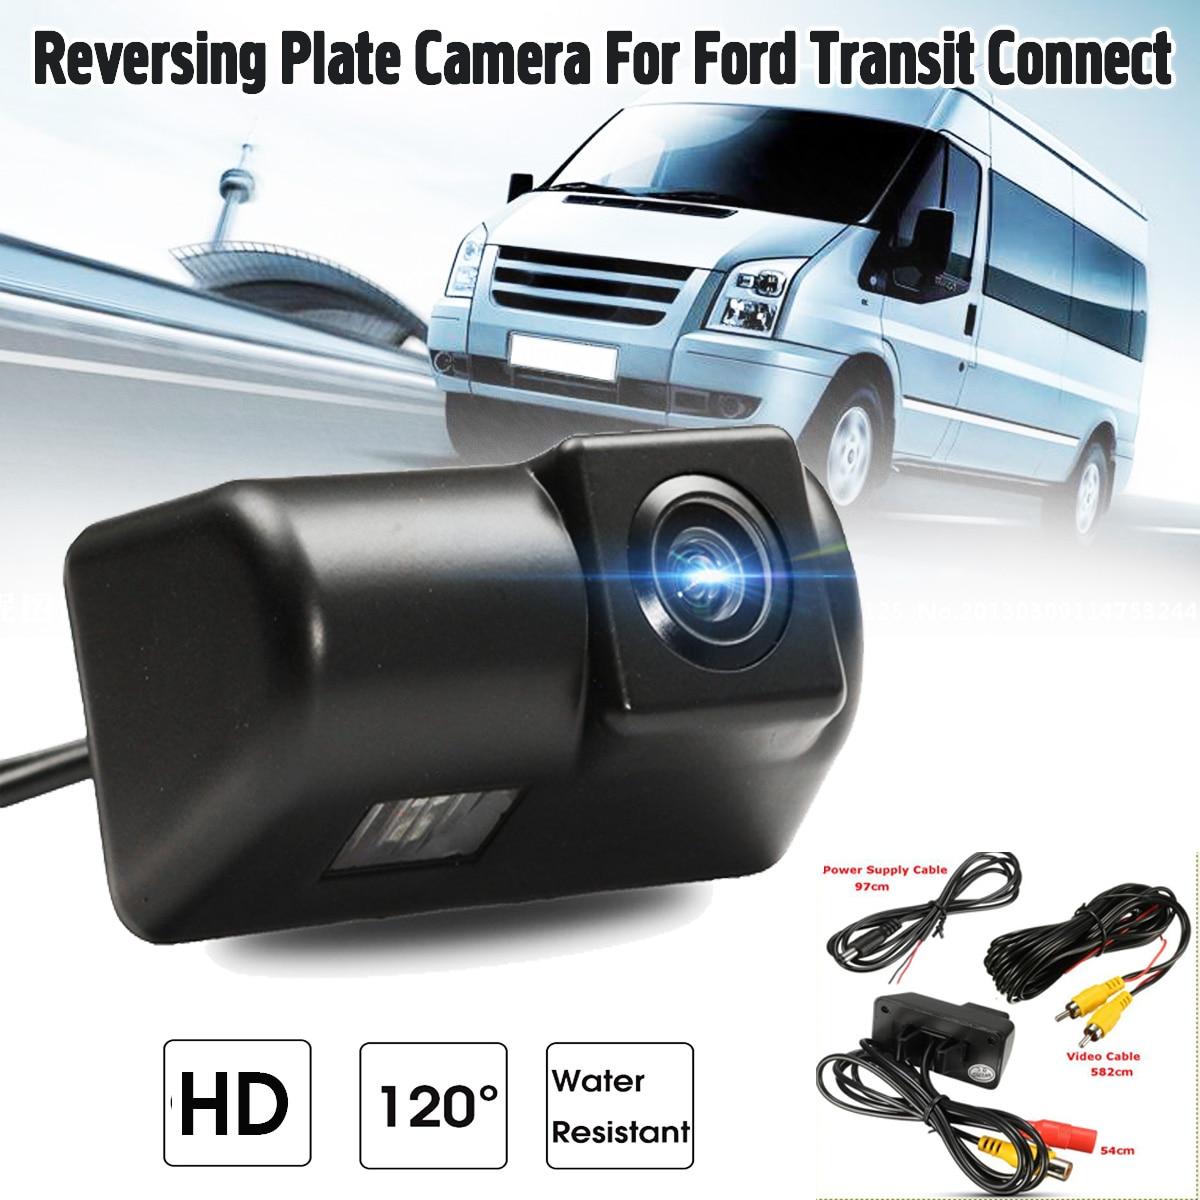 HD Водонепроницаемая камера заднего вида для Ford/Transit/Connect